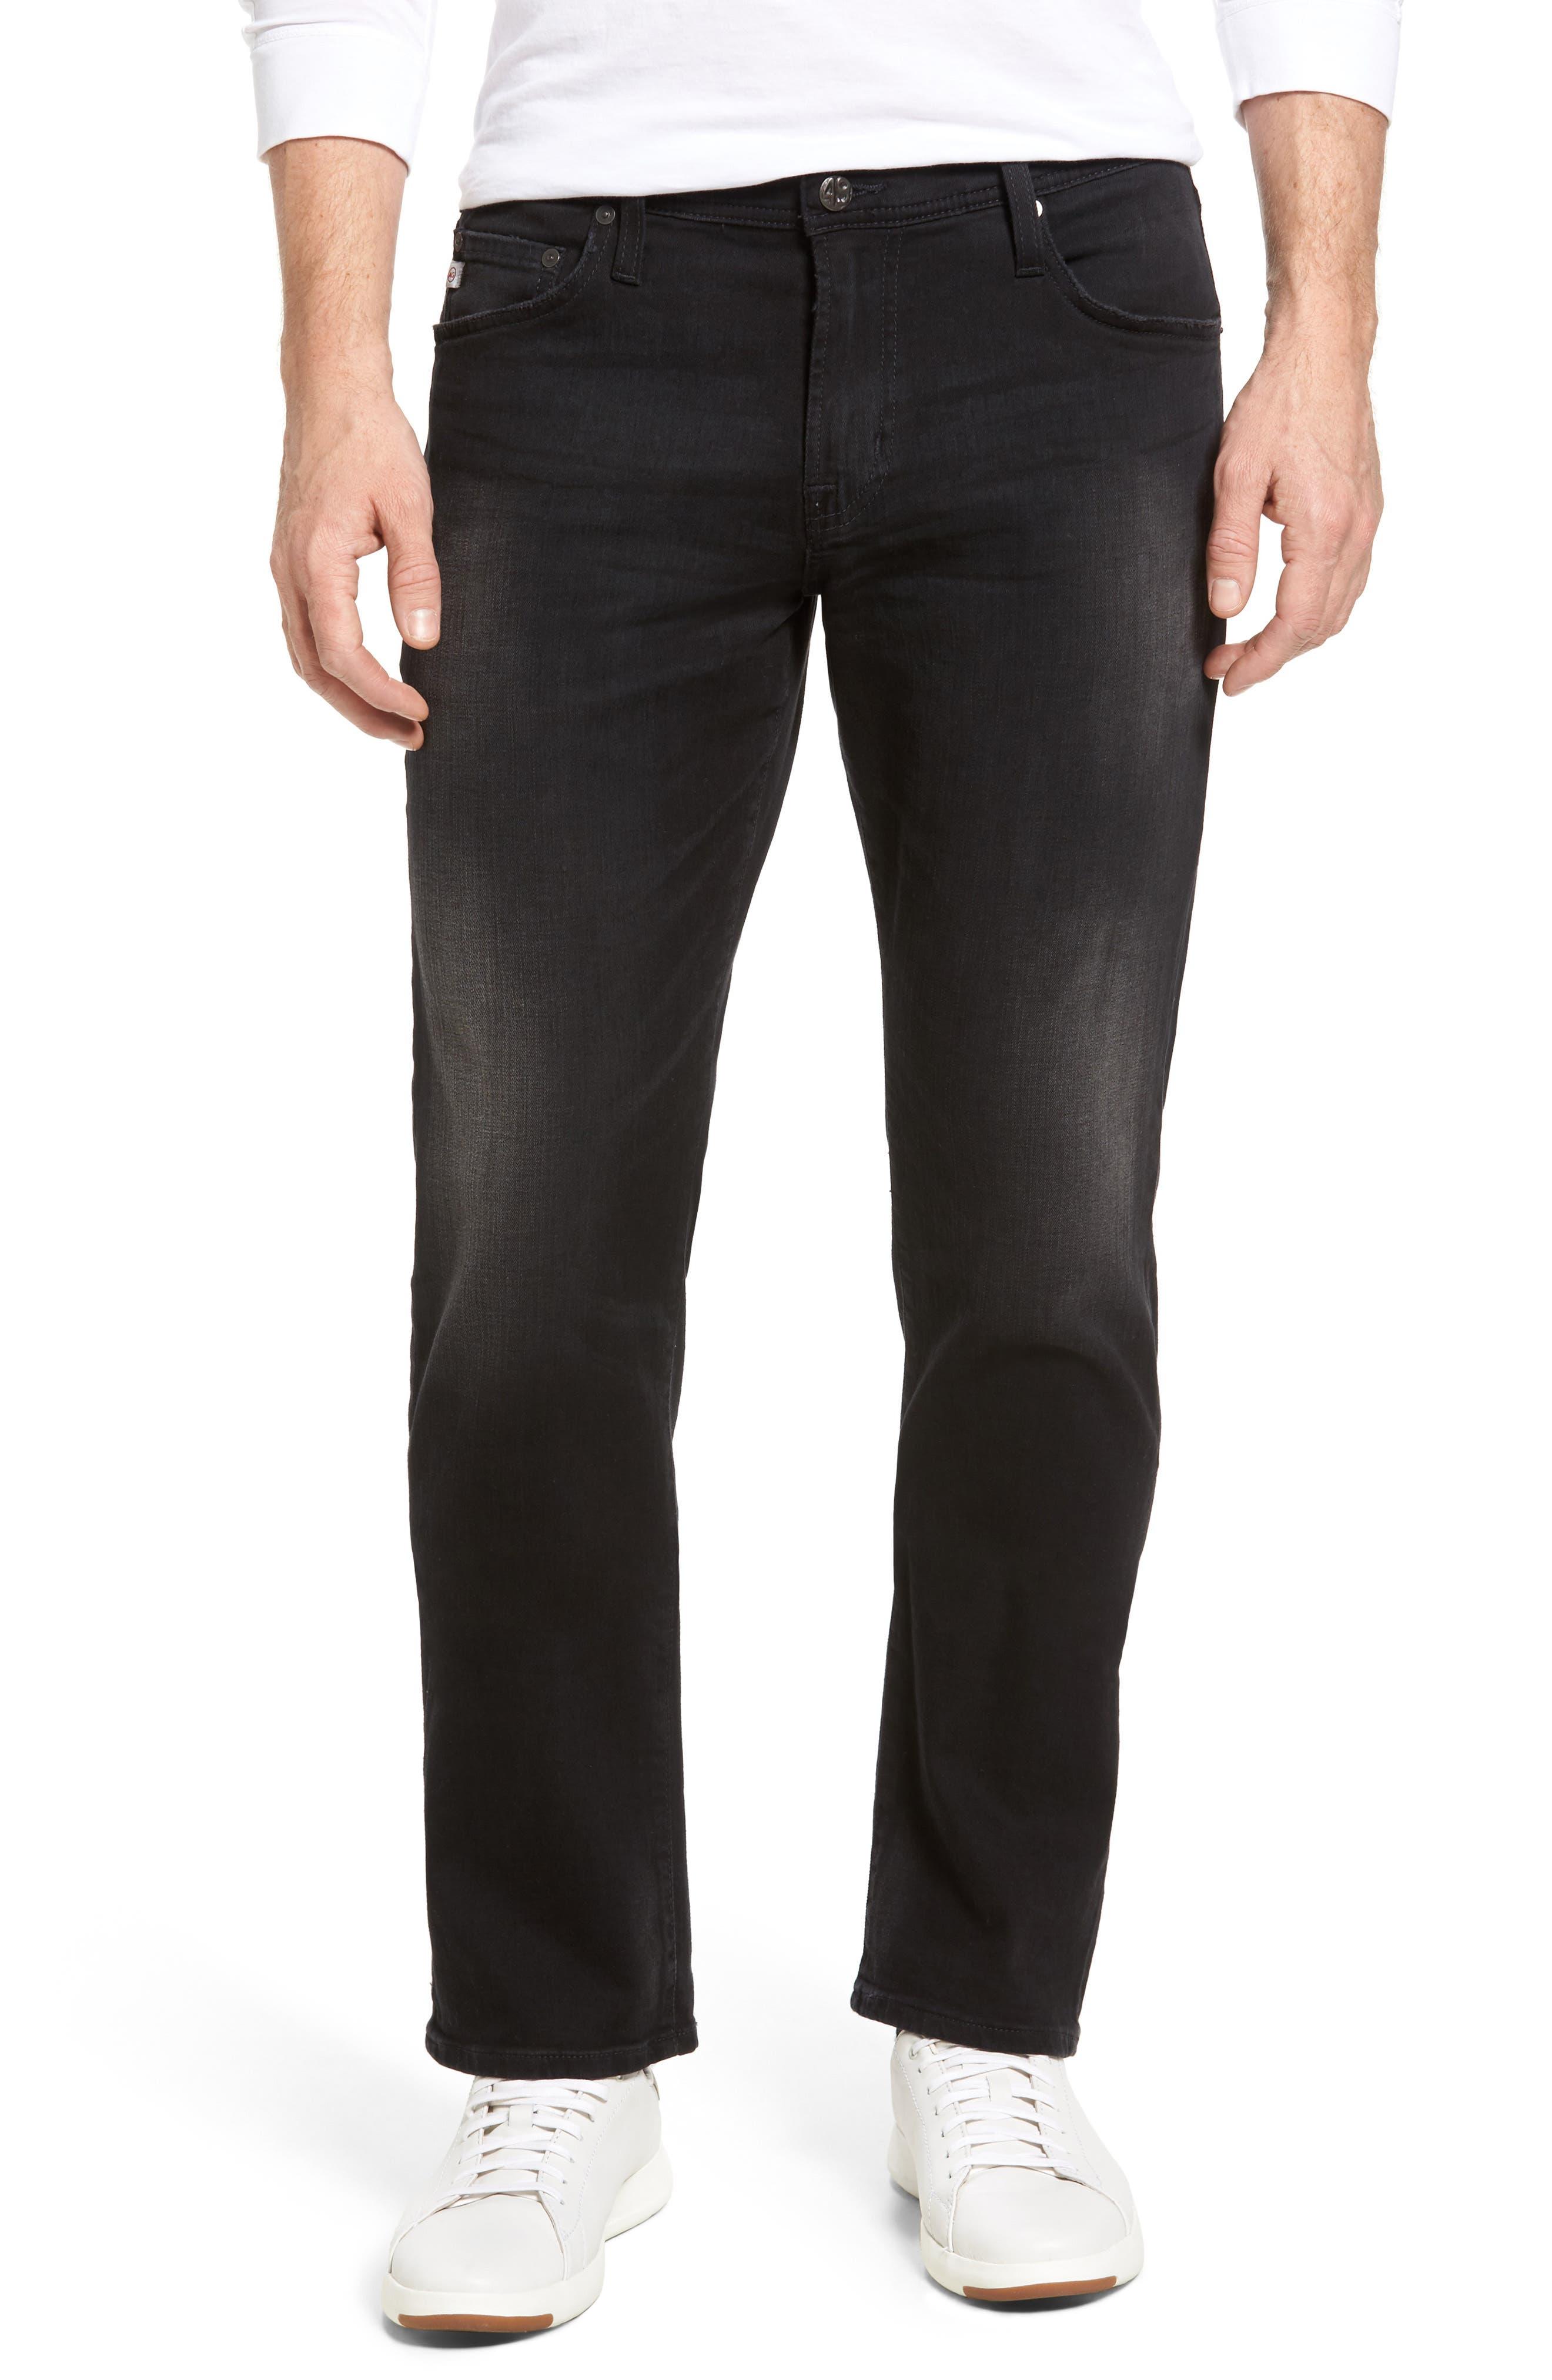 Graduate Slim Straight Leg Jeans,                             Main thumbnail 1, color,                             415